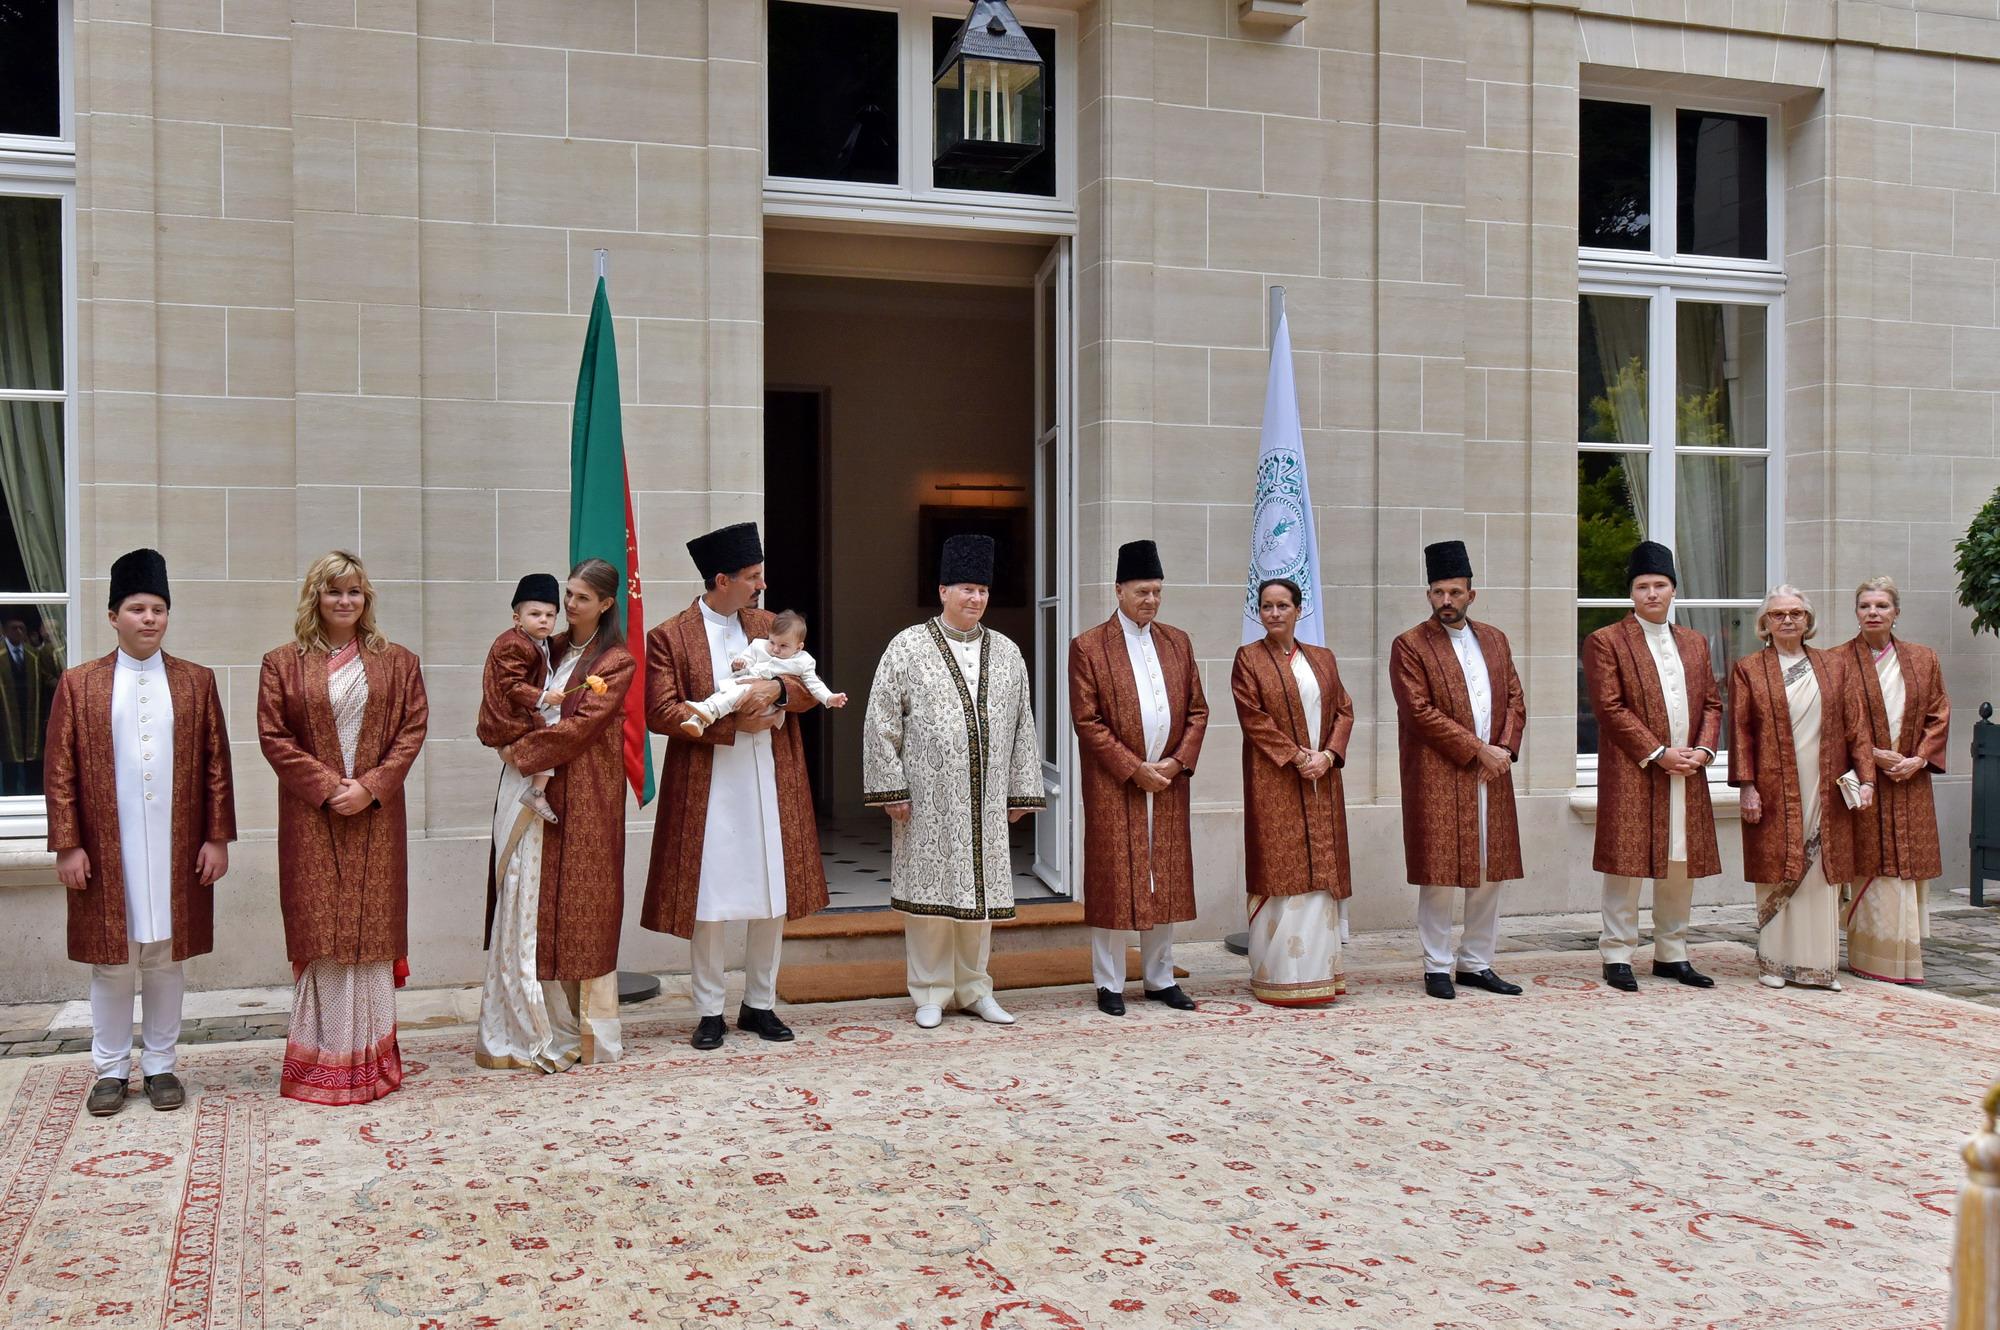 Aga Khan Diamond Jubilee barakah.com tribute to prince rahim aga khan